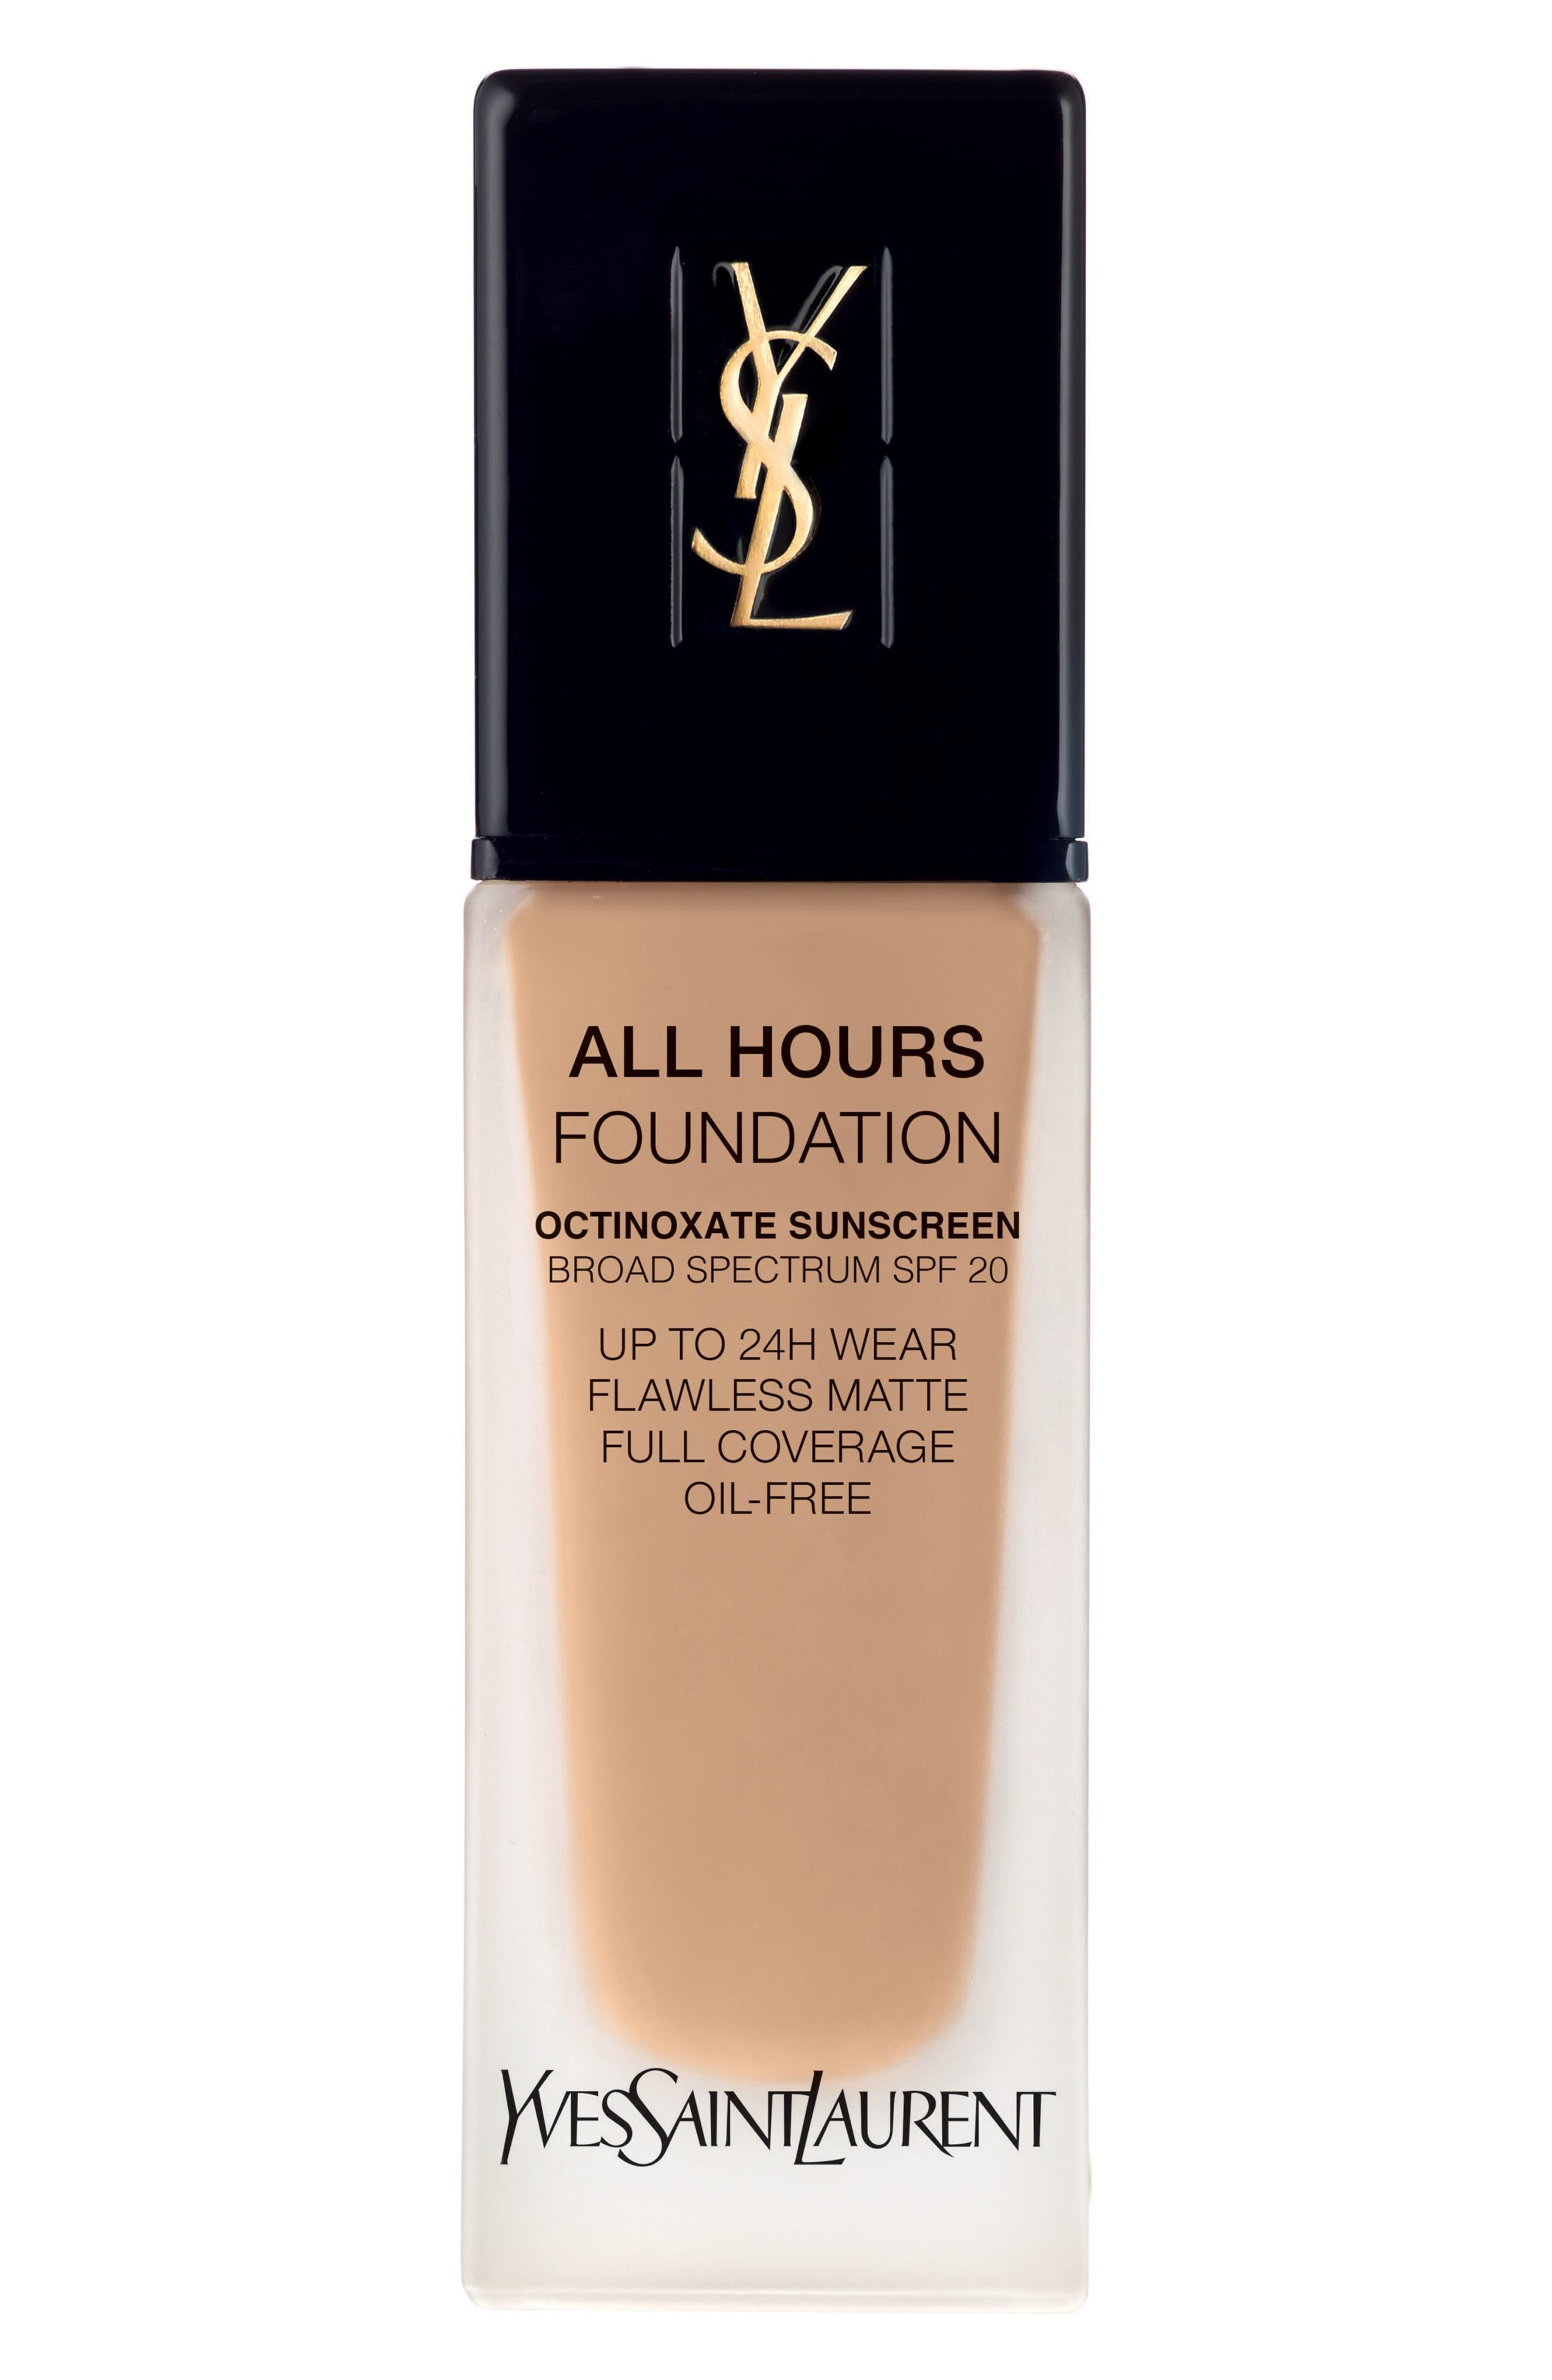 Yves Saint Laurent All Hours Full Coverage Matte Foundation Spf 20 - Bd40 Warm Sand